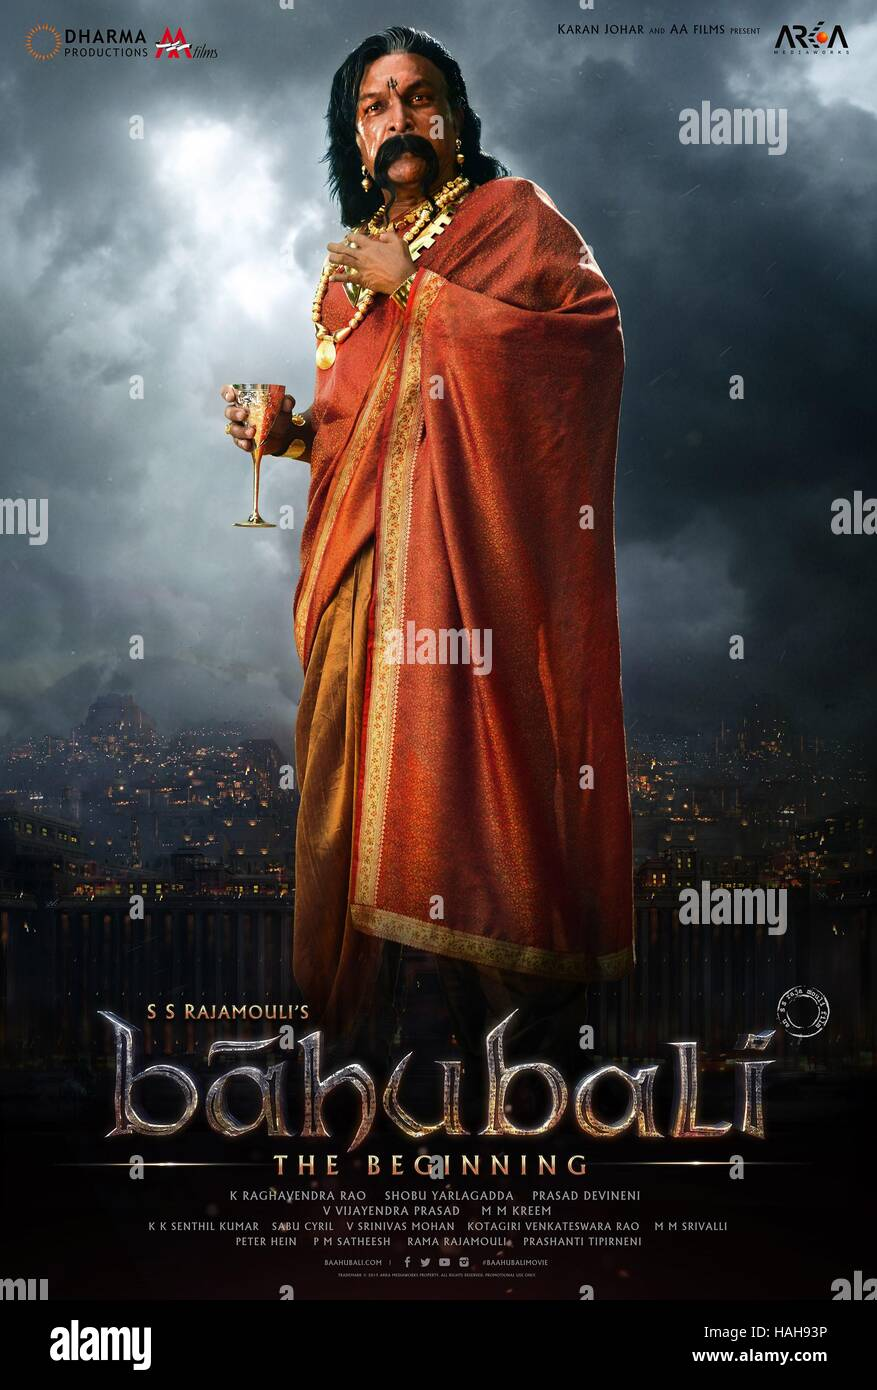 bahubali: the beginning year : 2015 india director : s.s. rajamouli